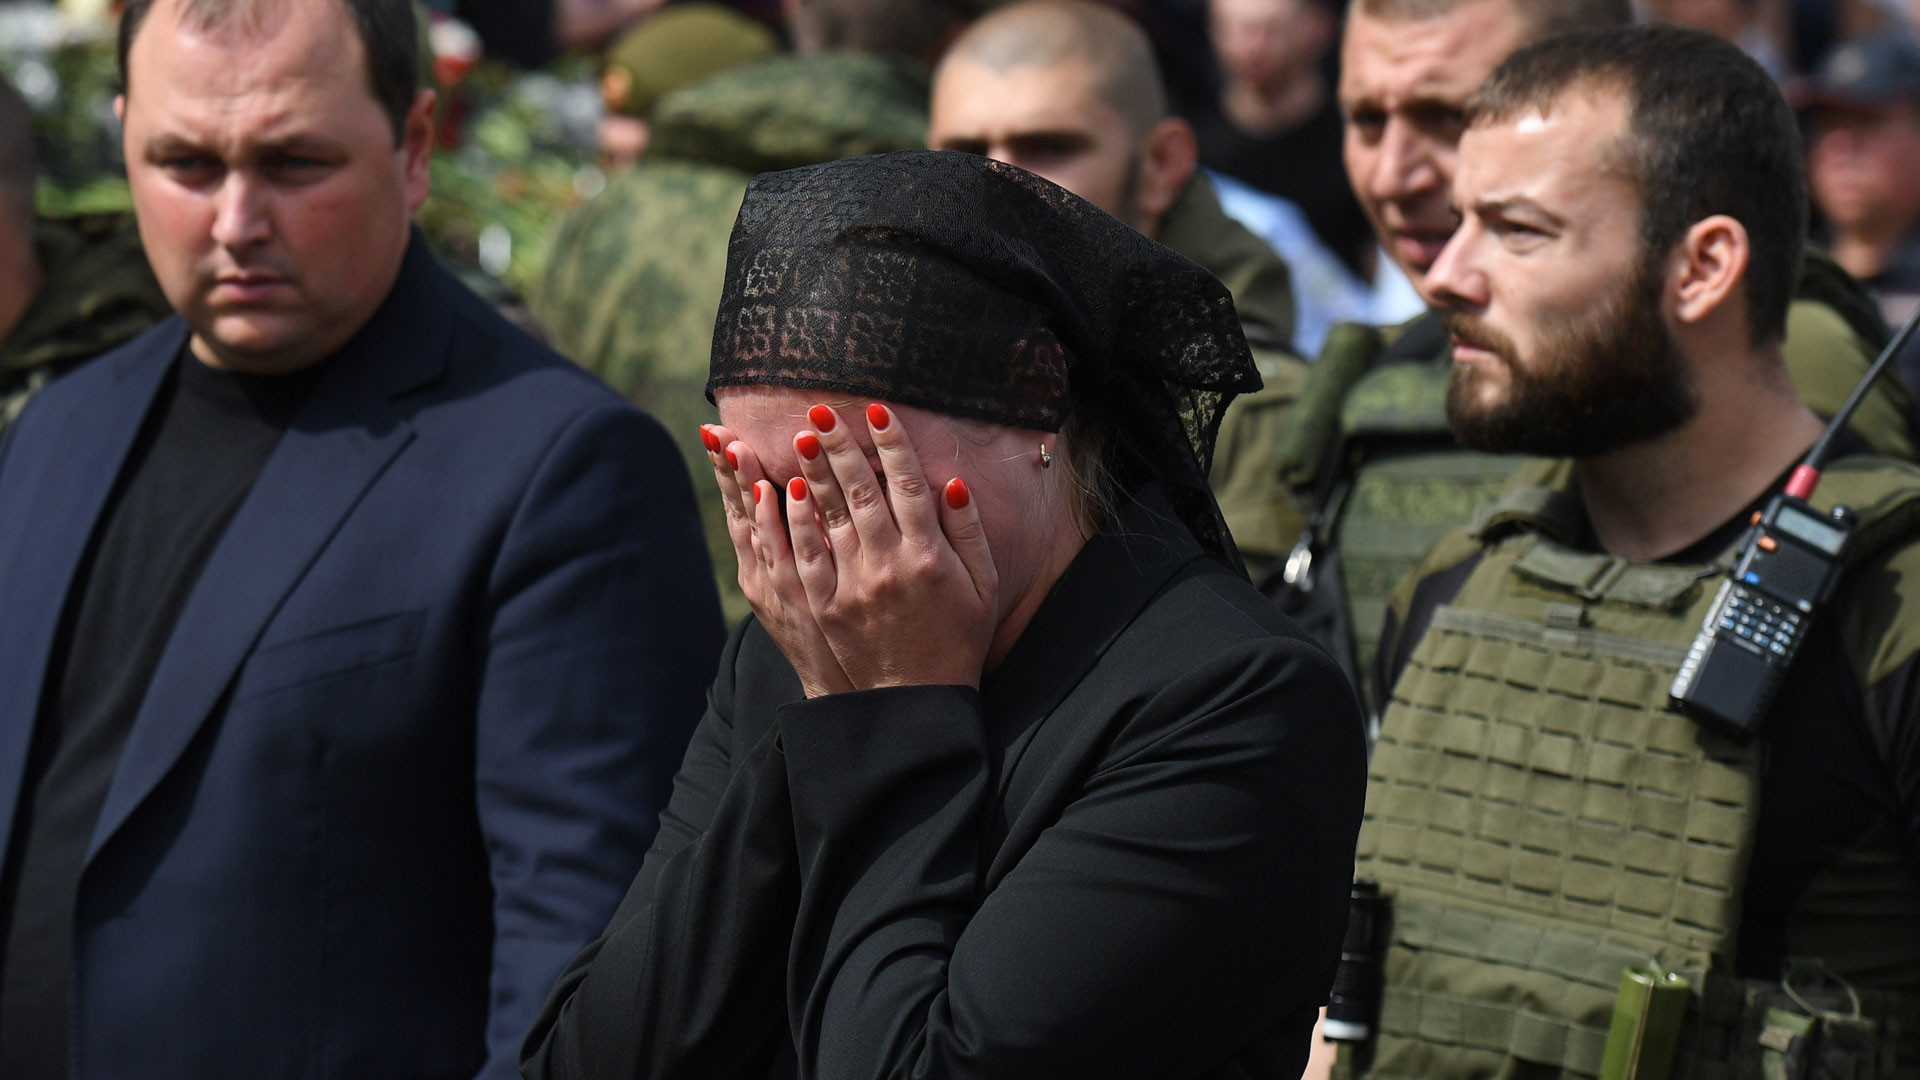 <p>Фото: &copy;&nbsp;РИА Новости/Валерий Мельников</p>